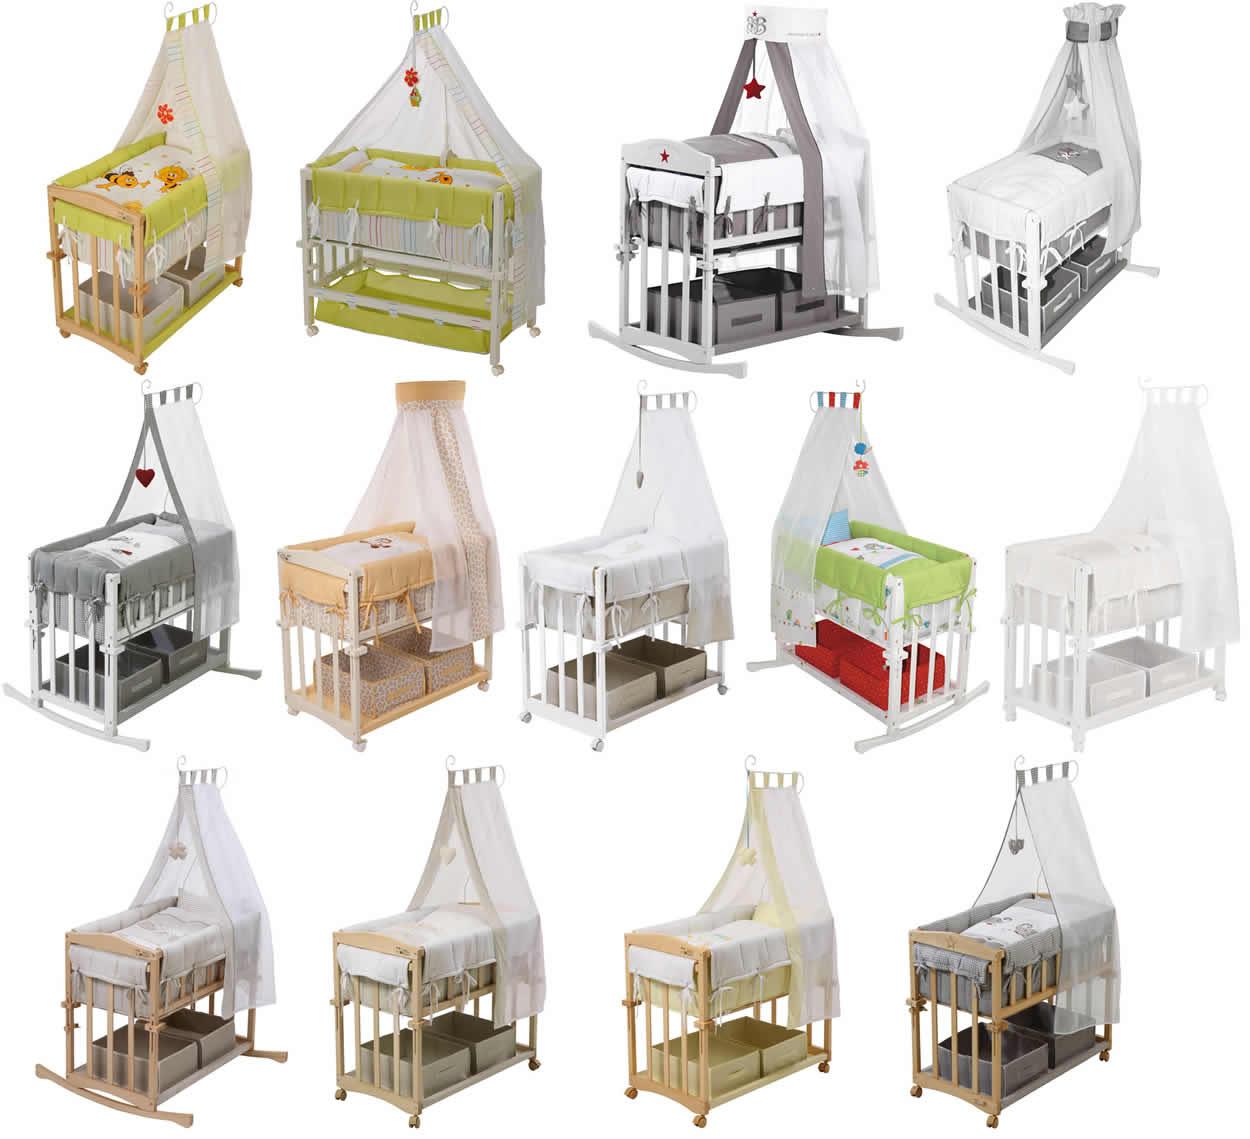 roba stubenbett 4in1 stubenwiege stubenwagen beistellbett. Black Bedroom Furniture Sets. Home Design Ideas